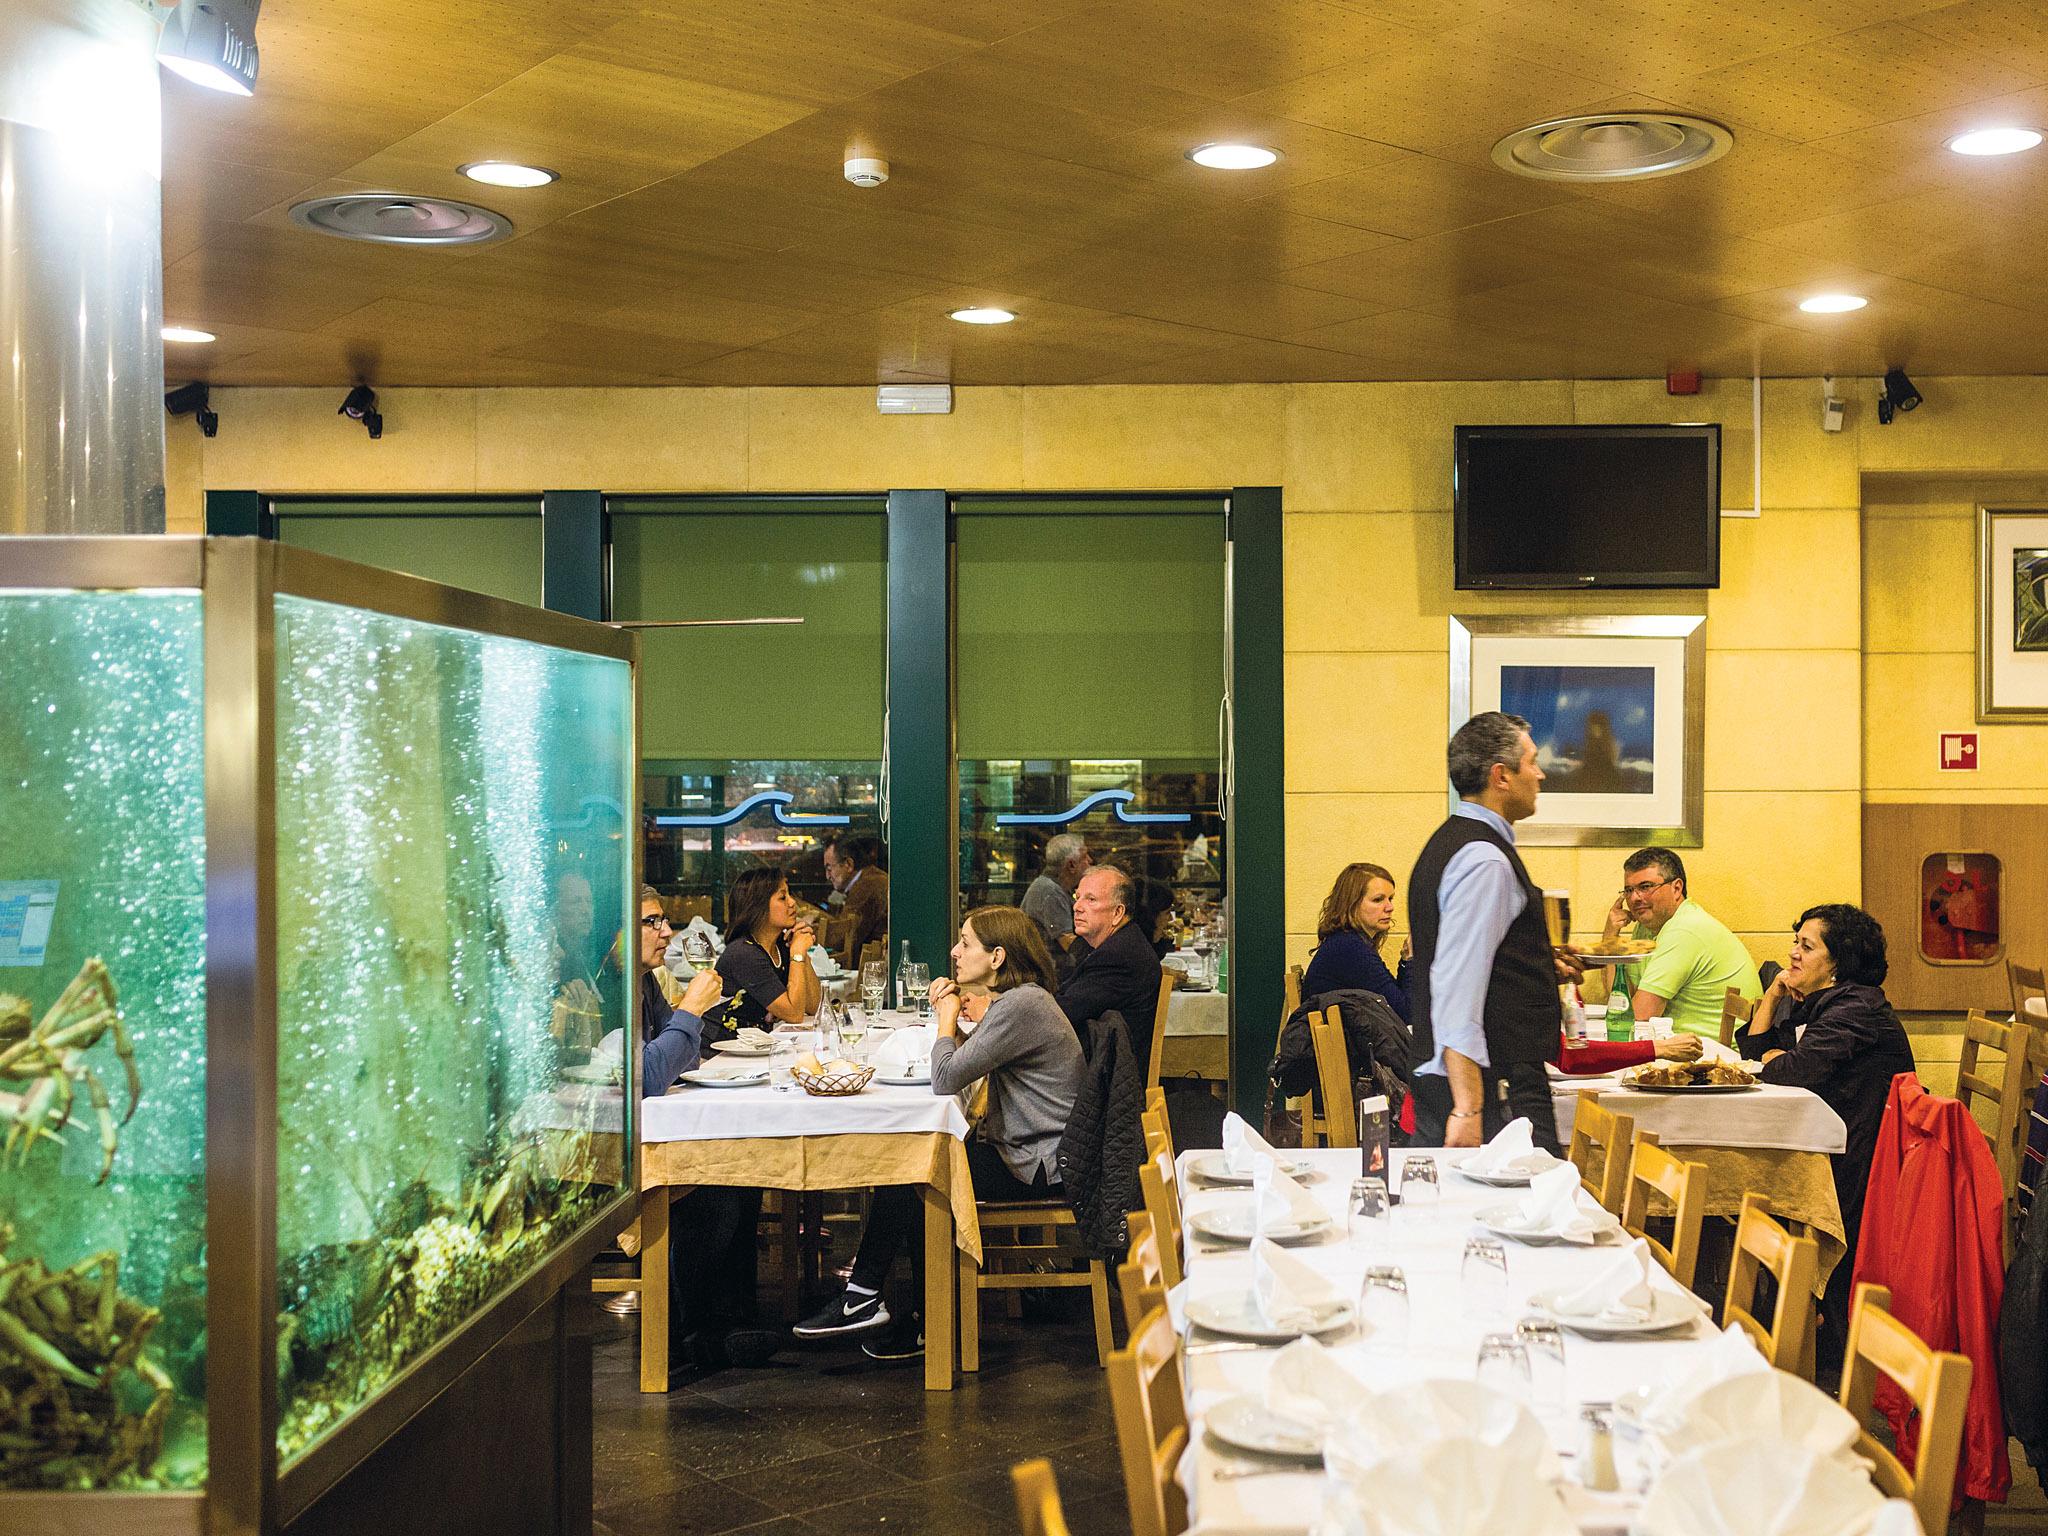 Restaurante Sete Mares - Sala